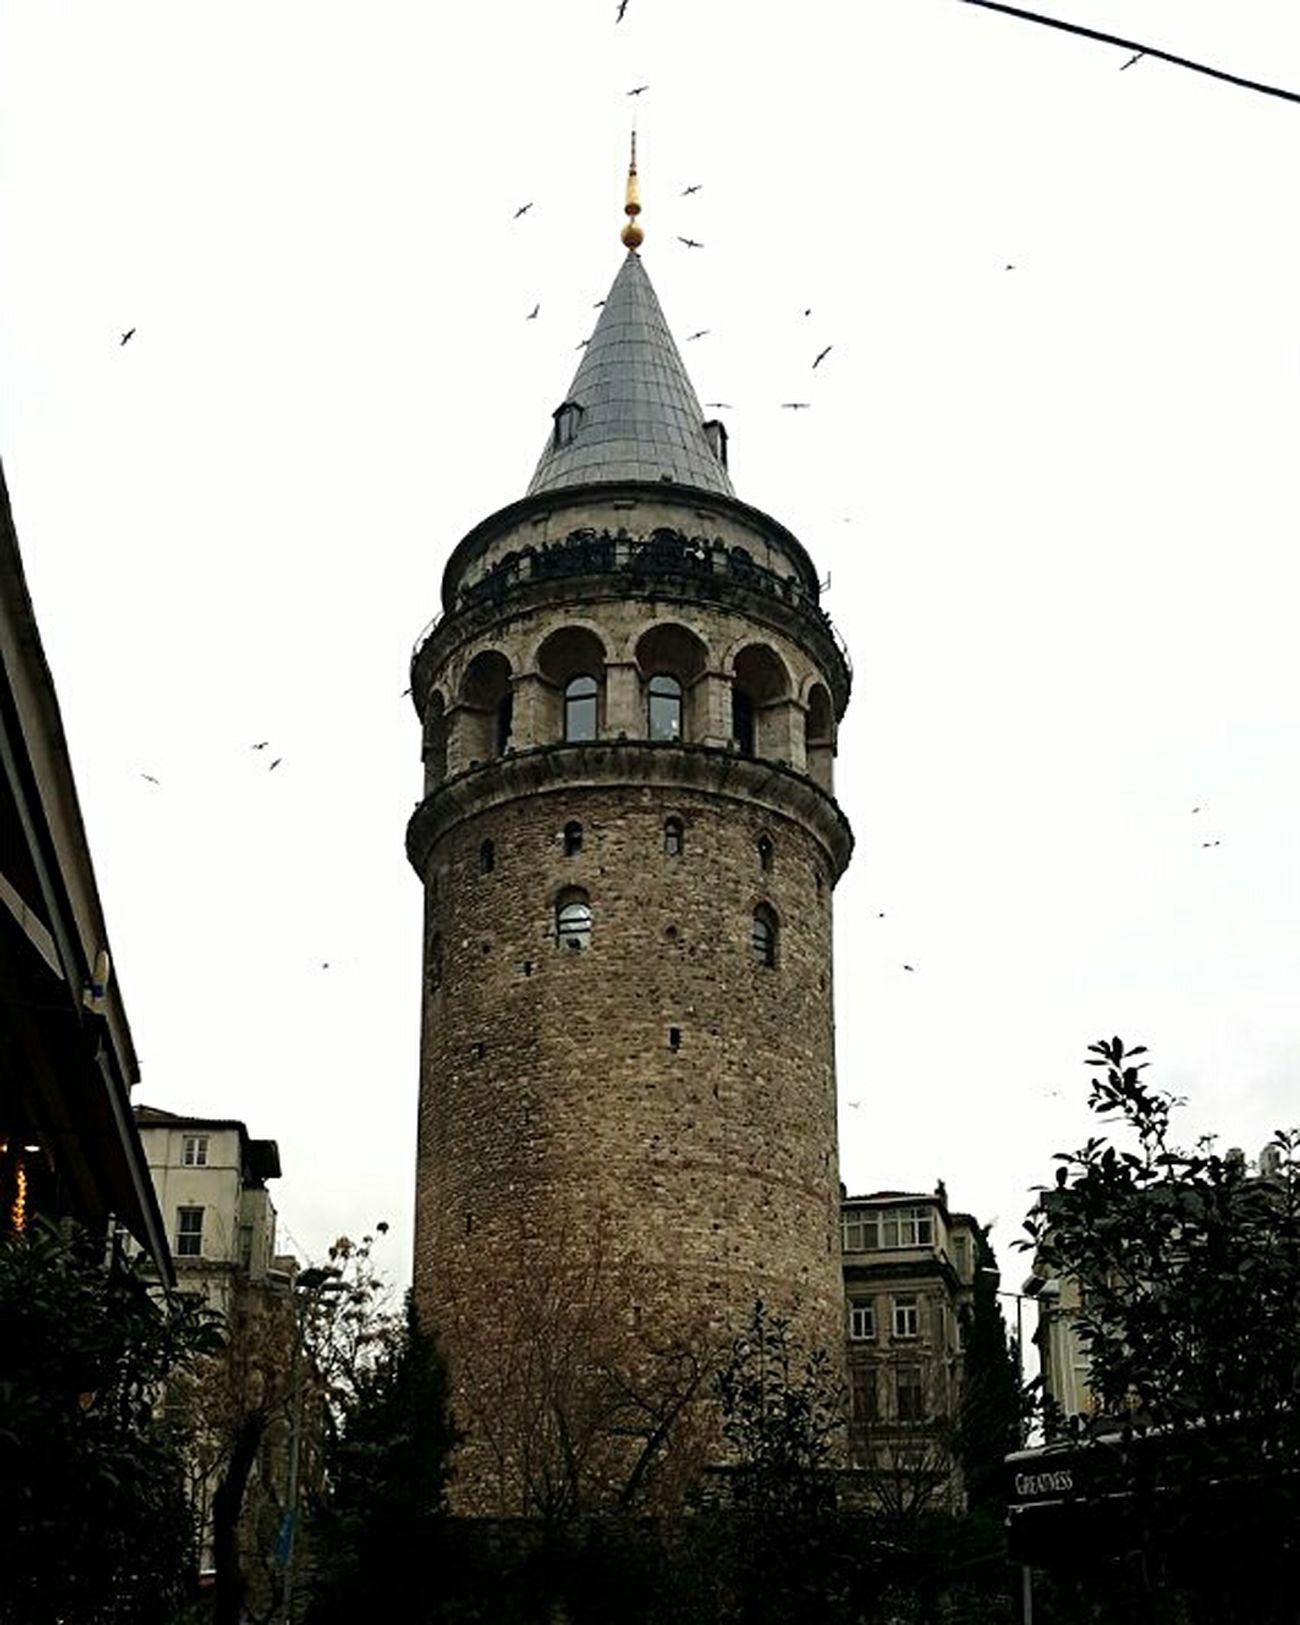 Стамбул мойСтамбул встречасмоимСтамбулом галатскаябашня декабрь2014